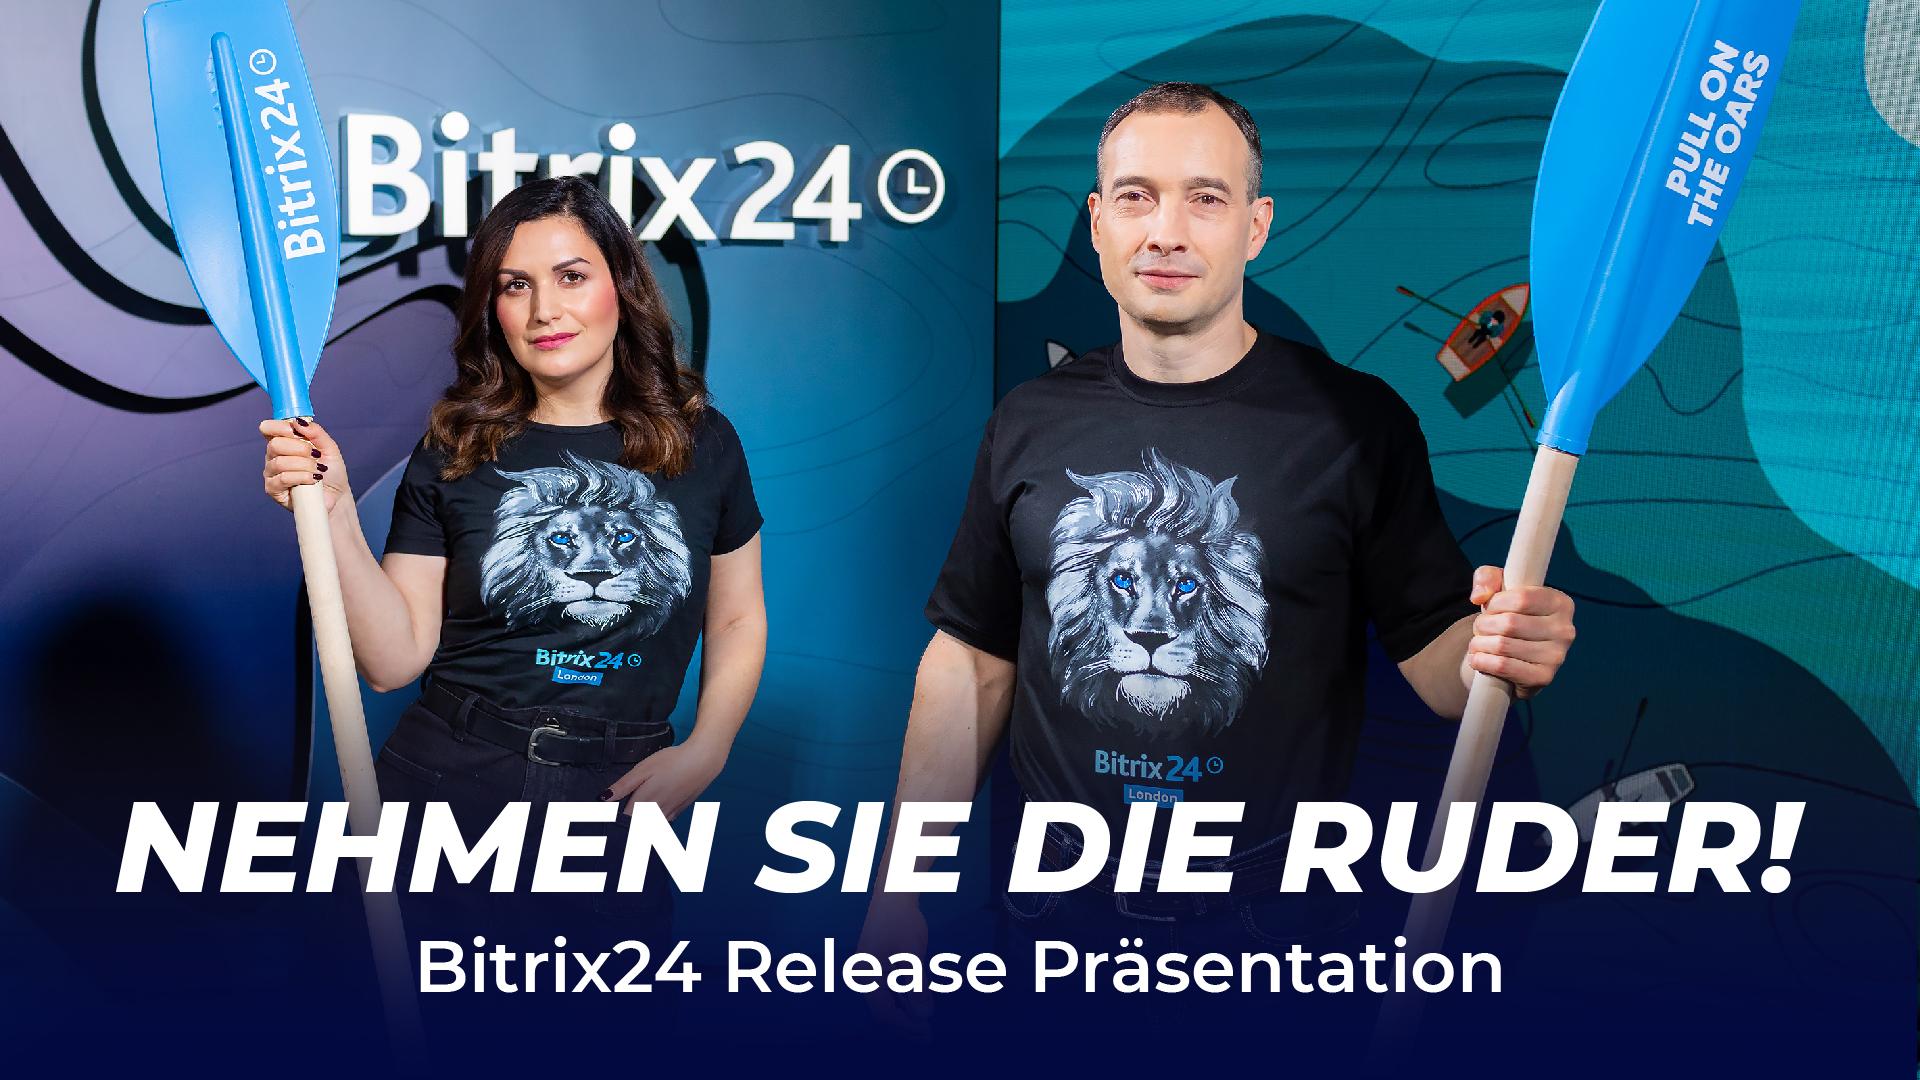 Bitrix24 Release Präsentation: Jetzt verfügbar!